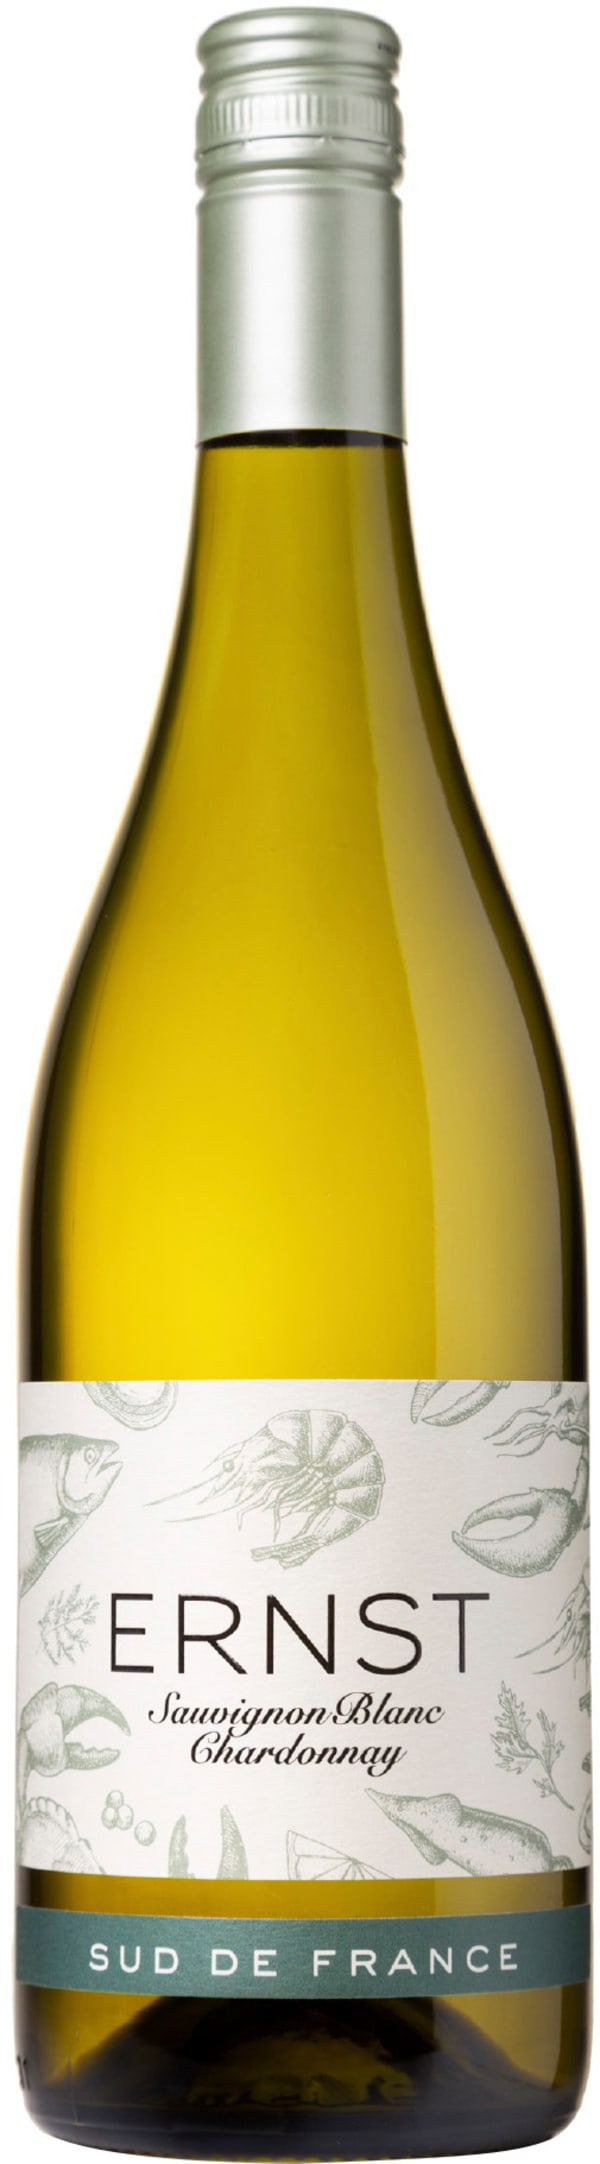 Ernst Sauvigno Blanc Chardonnay 2018